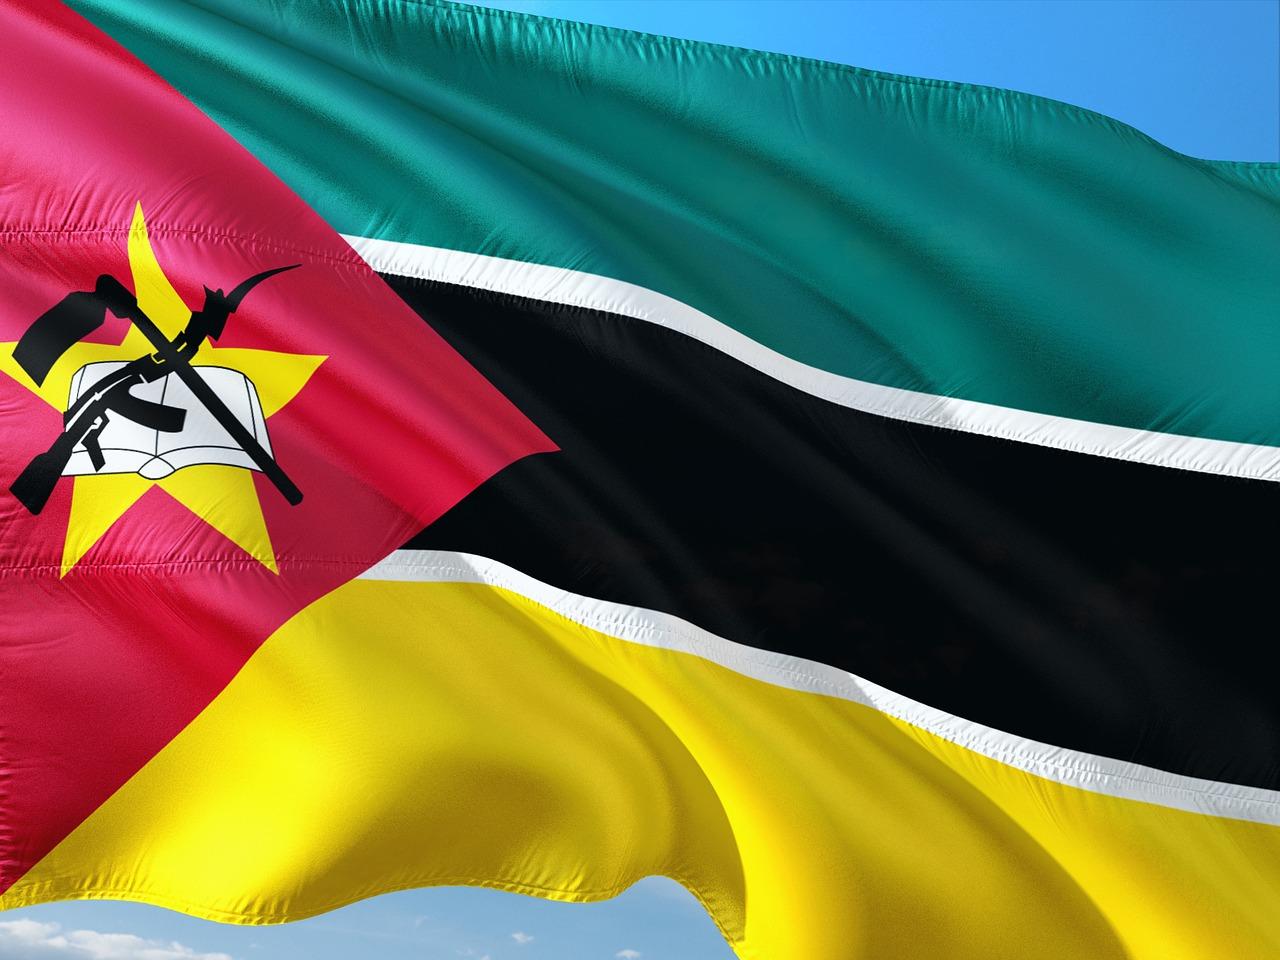 Mozambik sa pripája k dohode o hospodárskom partnerstve medzi EÚ a juhoafrickými štátmi